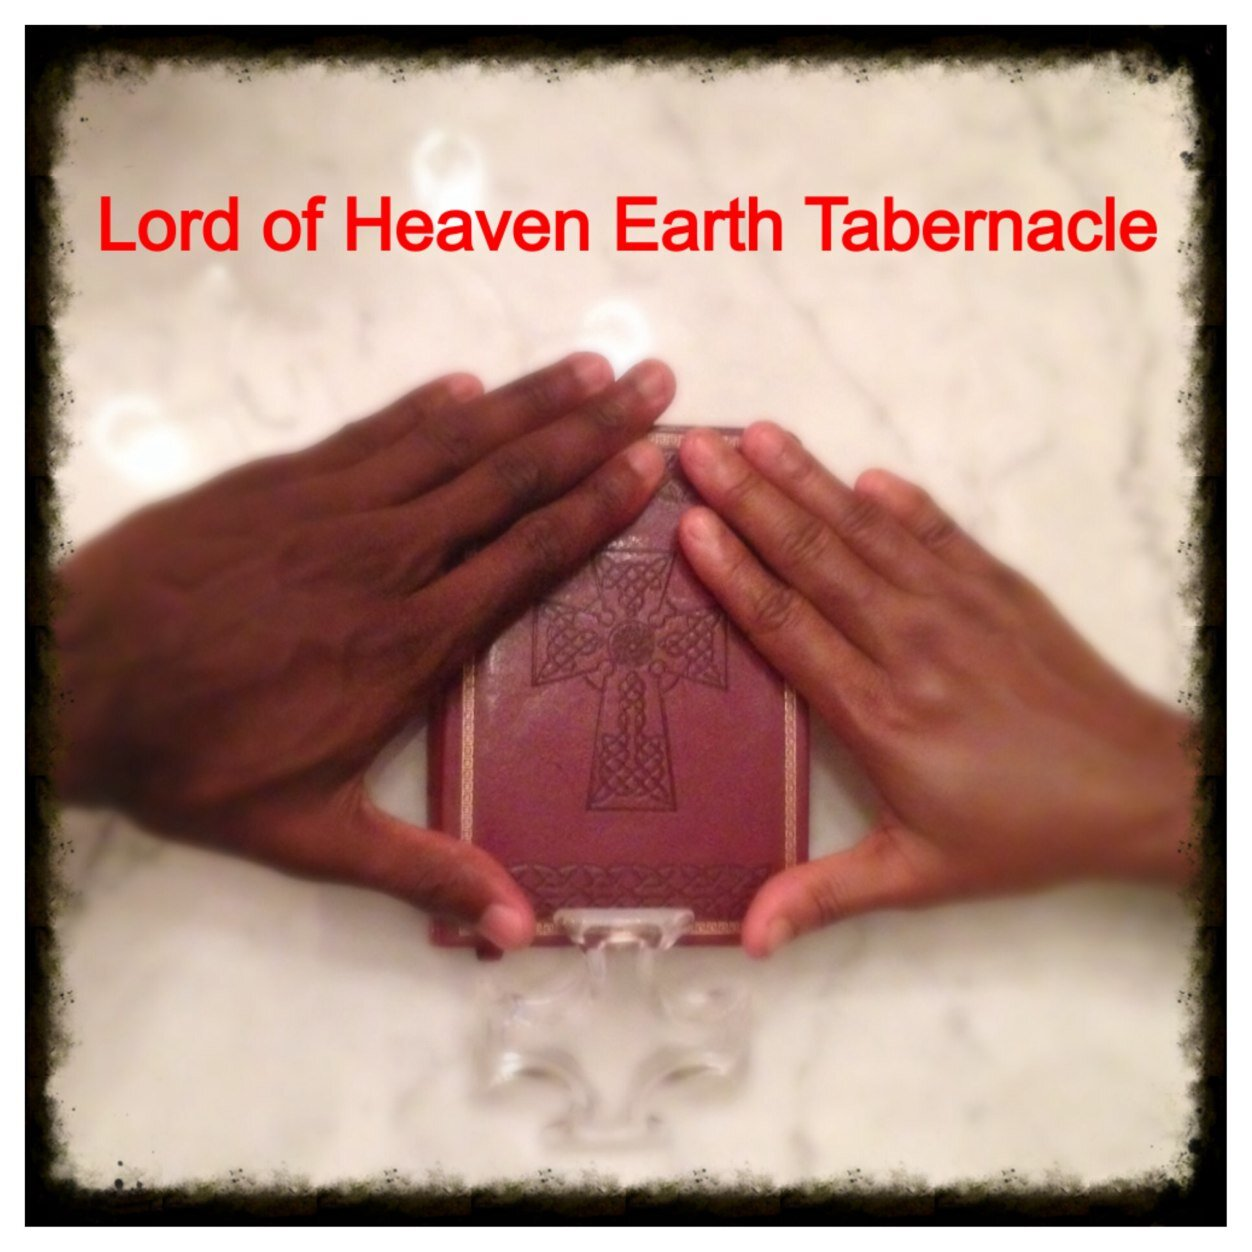 Lord of Heaven Earth